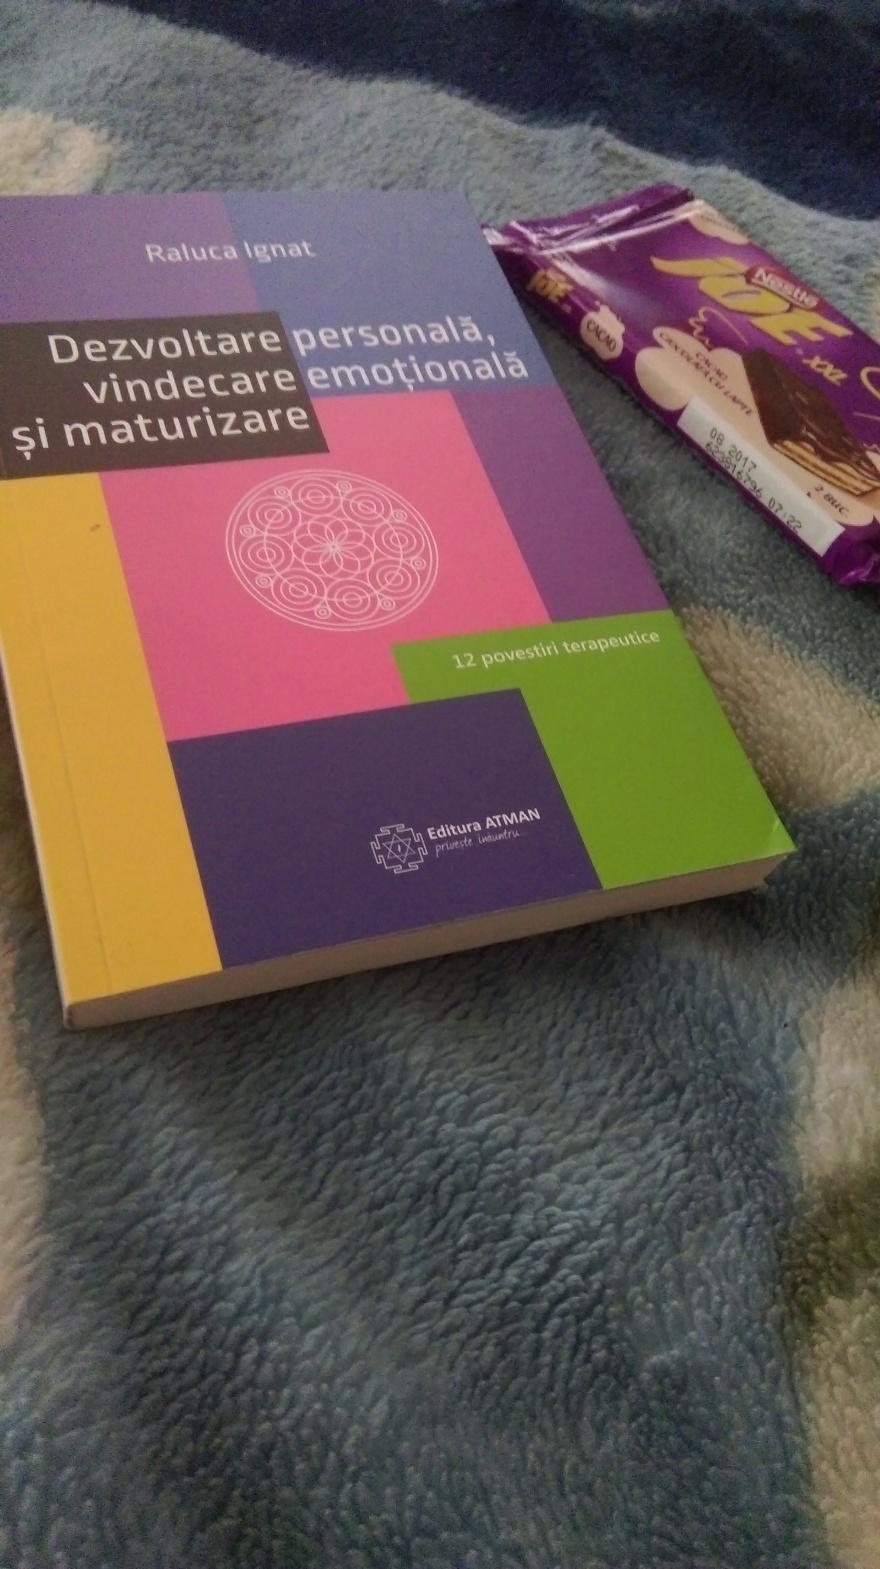 dezvoltare-personala-vindecare-emotionala-si-maturizare-raluca-ignat